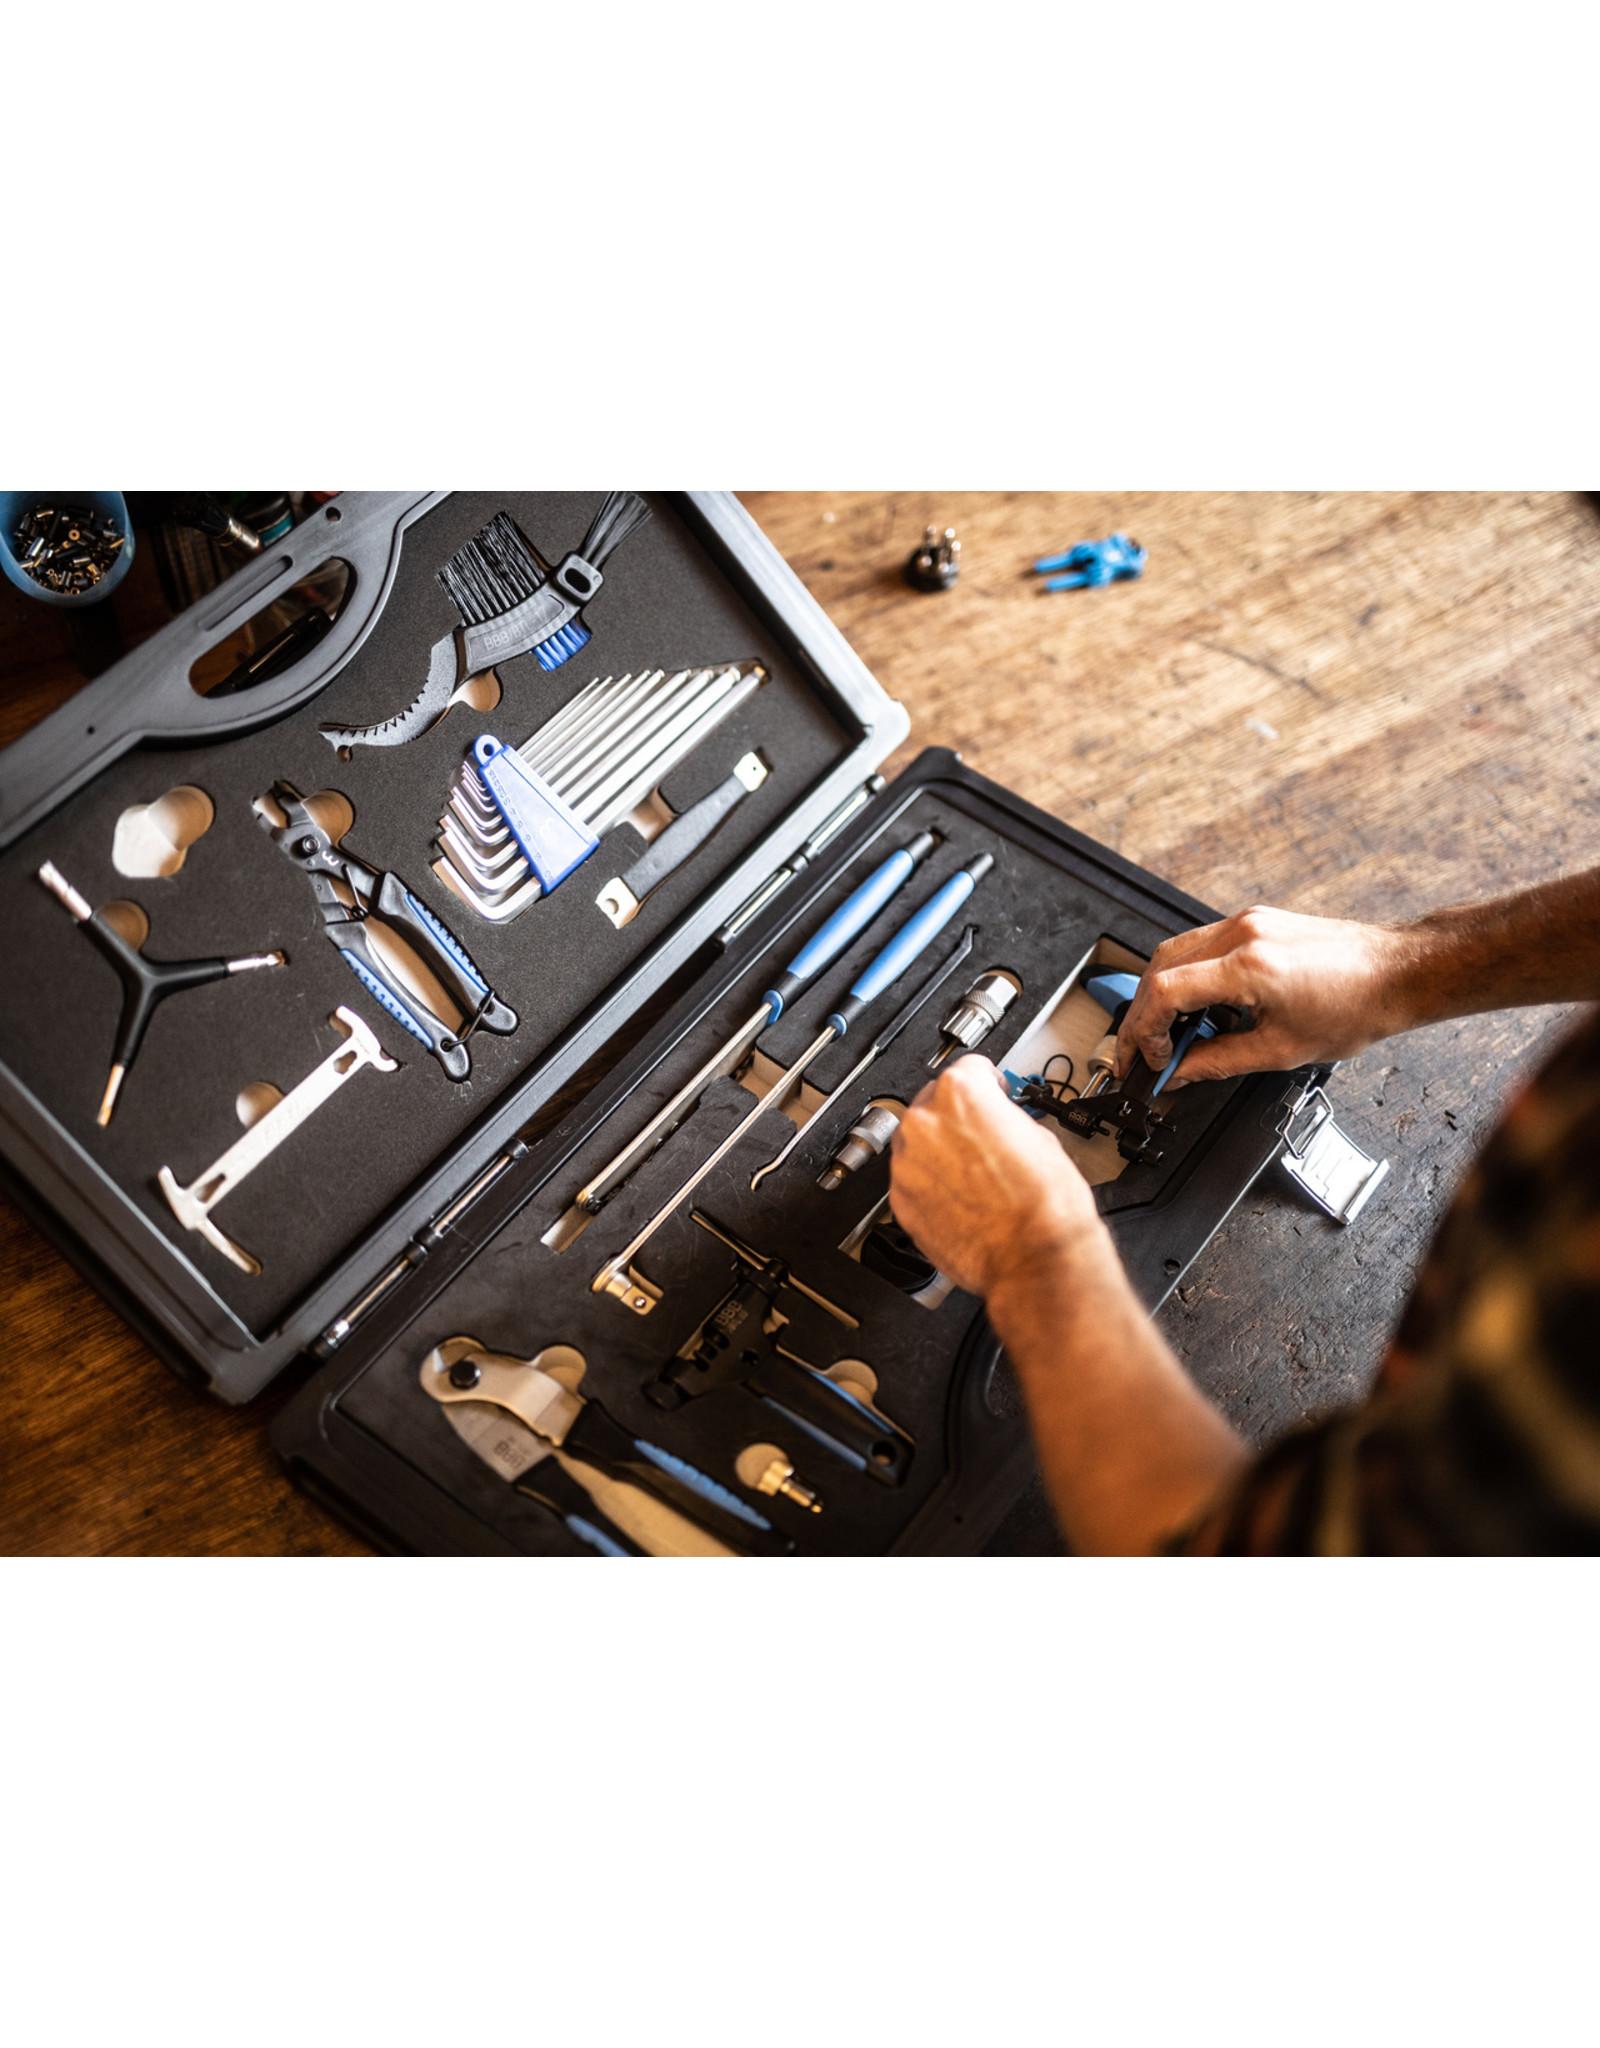 BTL-91 BBB AllroundKit Tool Kit